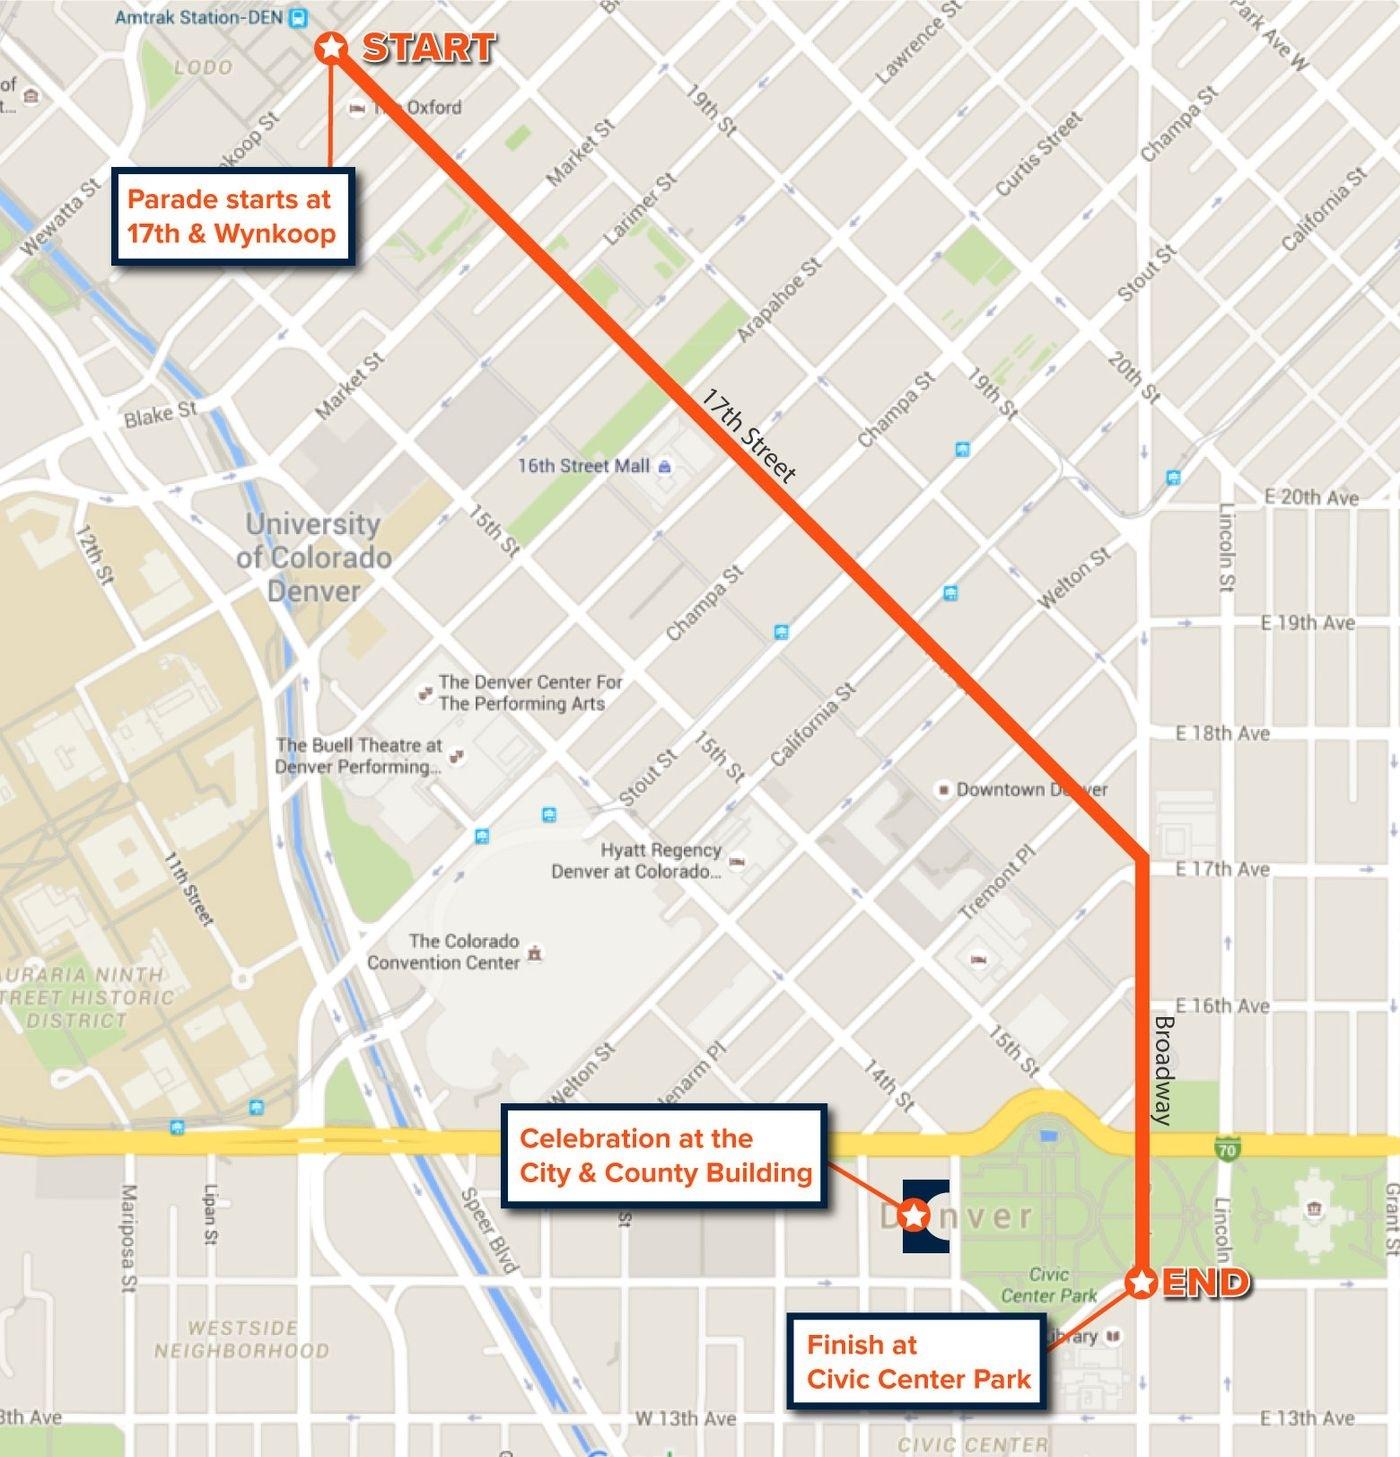 Super Bowl Parade 2016 Map And Route For Denver Broncos pertaining to Super Bowl Parade Route Map